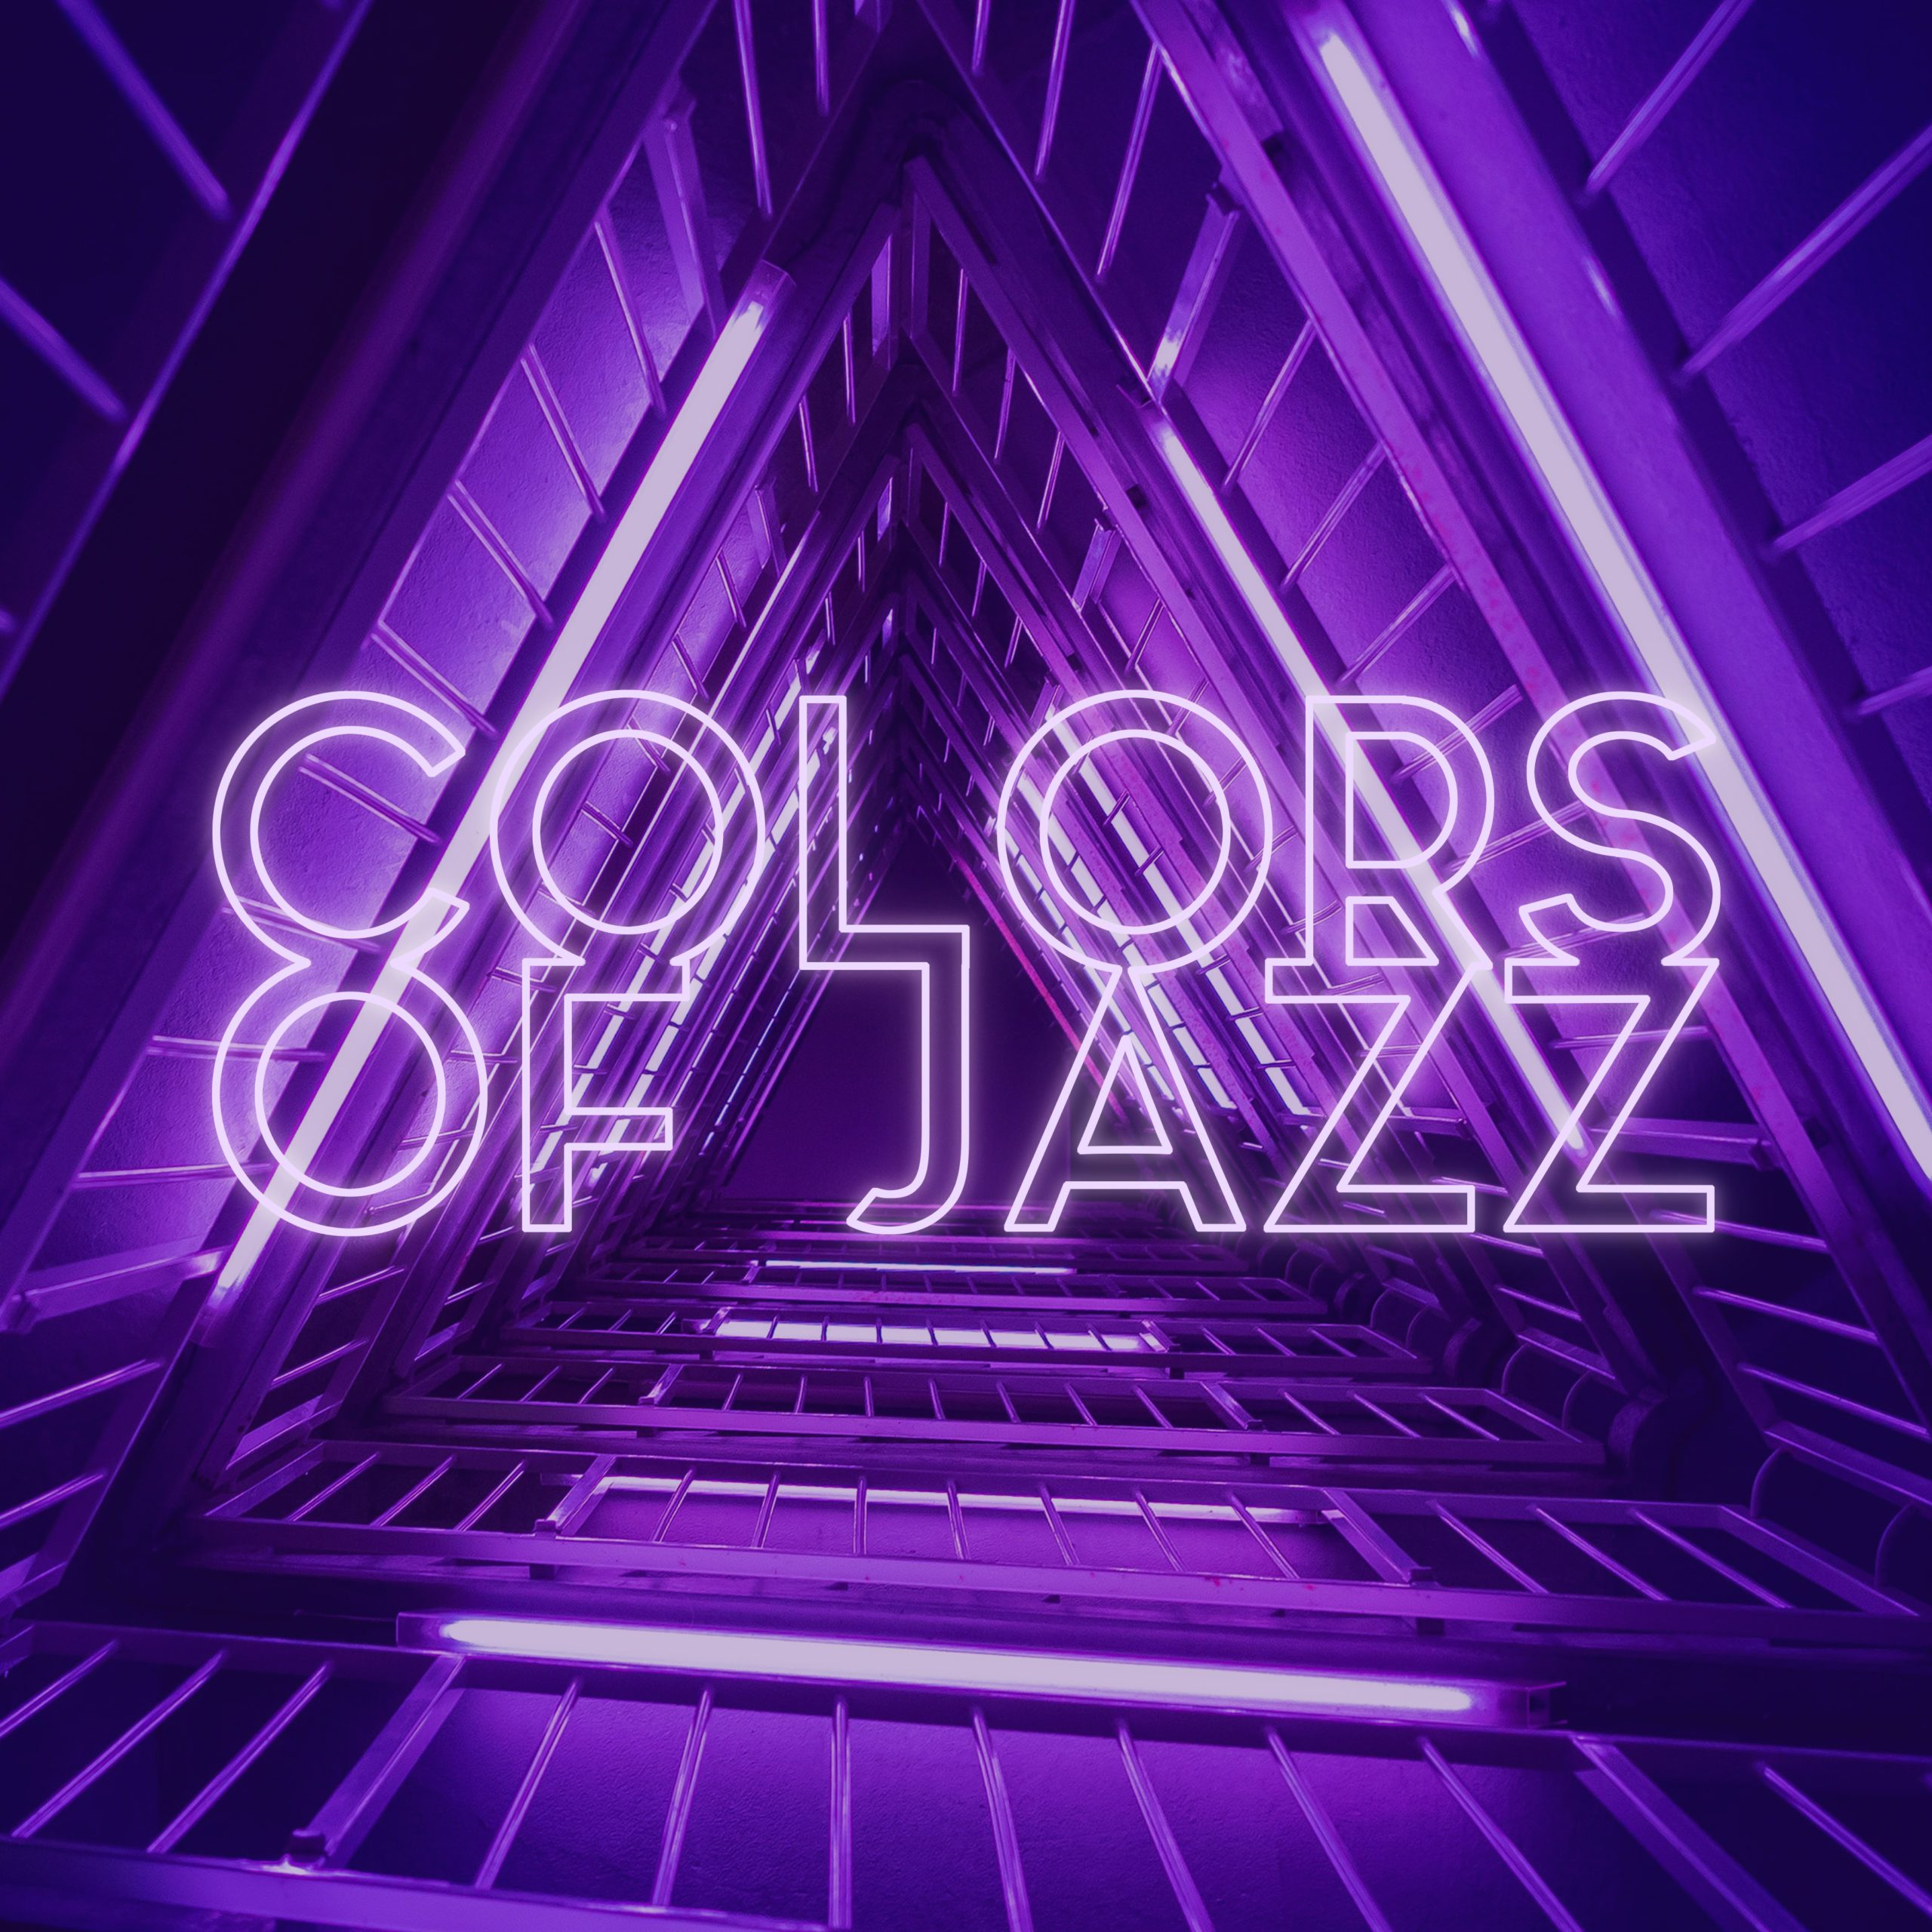 color-of-jazz-shirts-purple